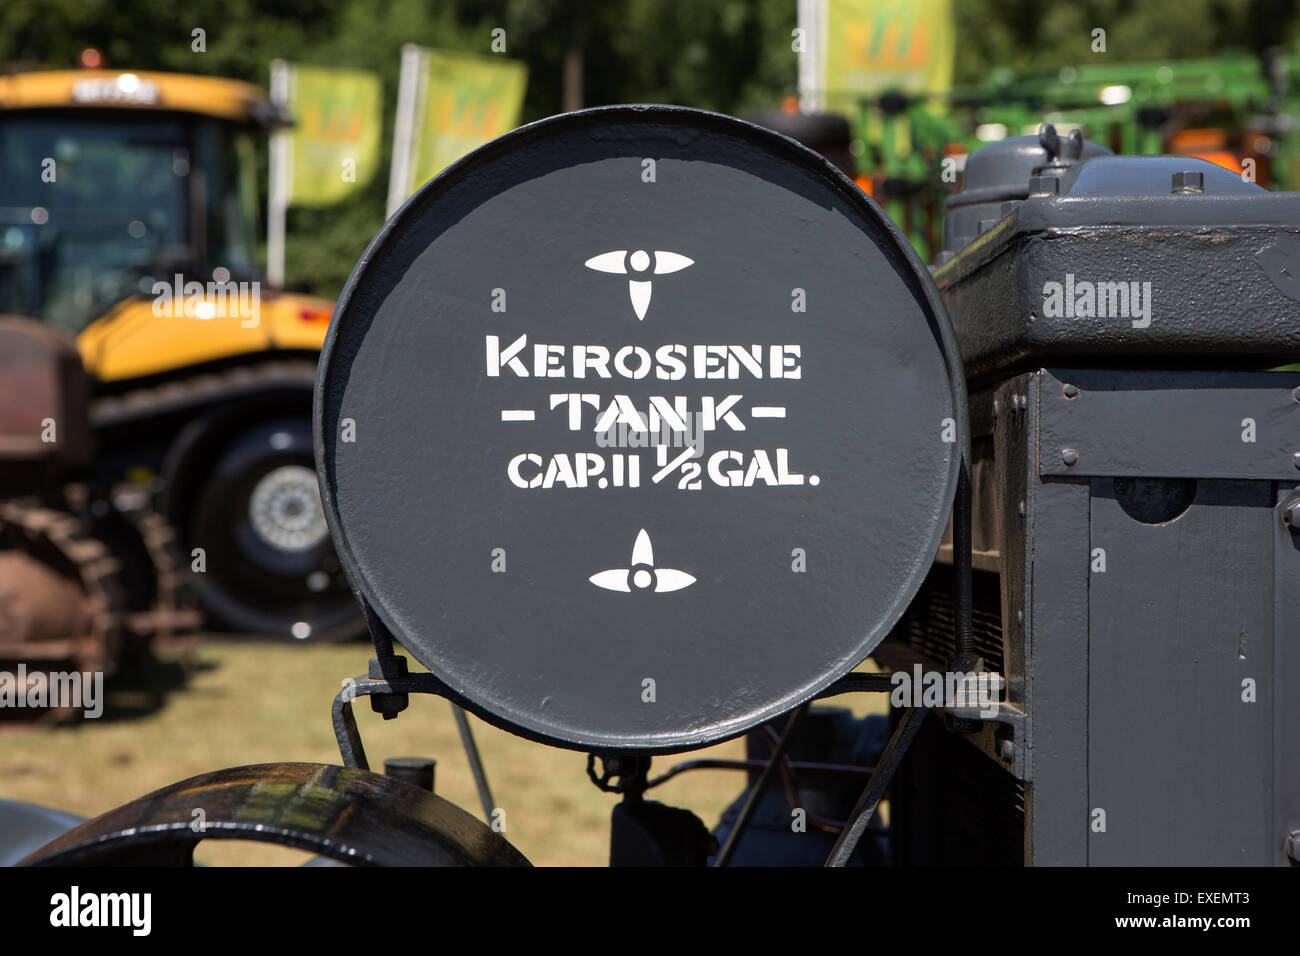 Tractor Kerosene Tank - Stock Image